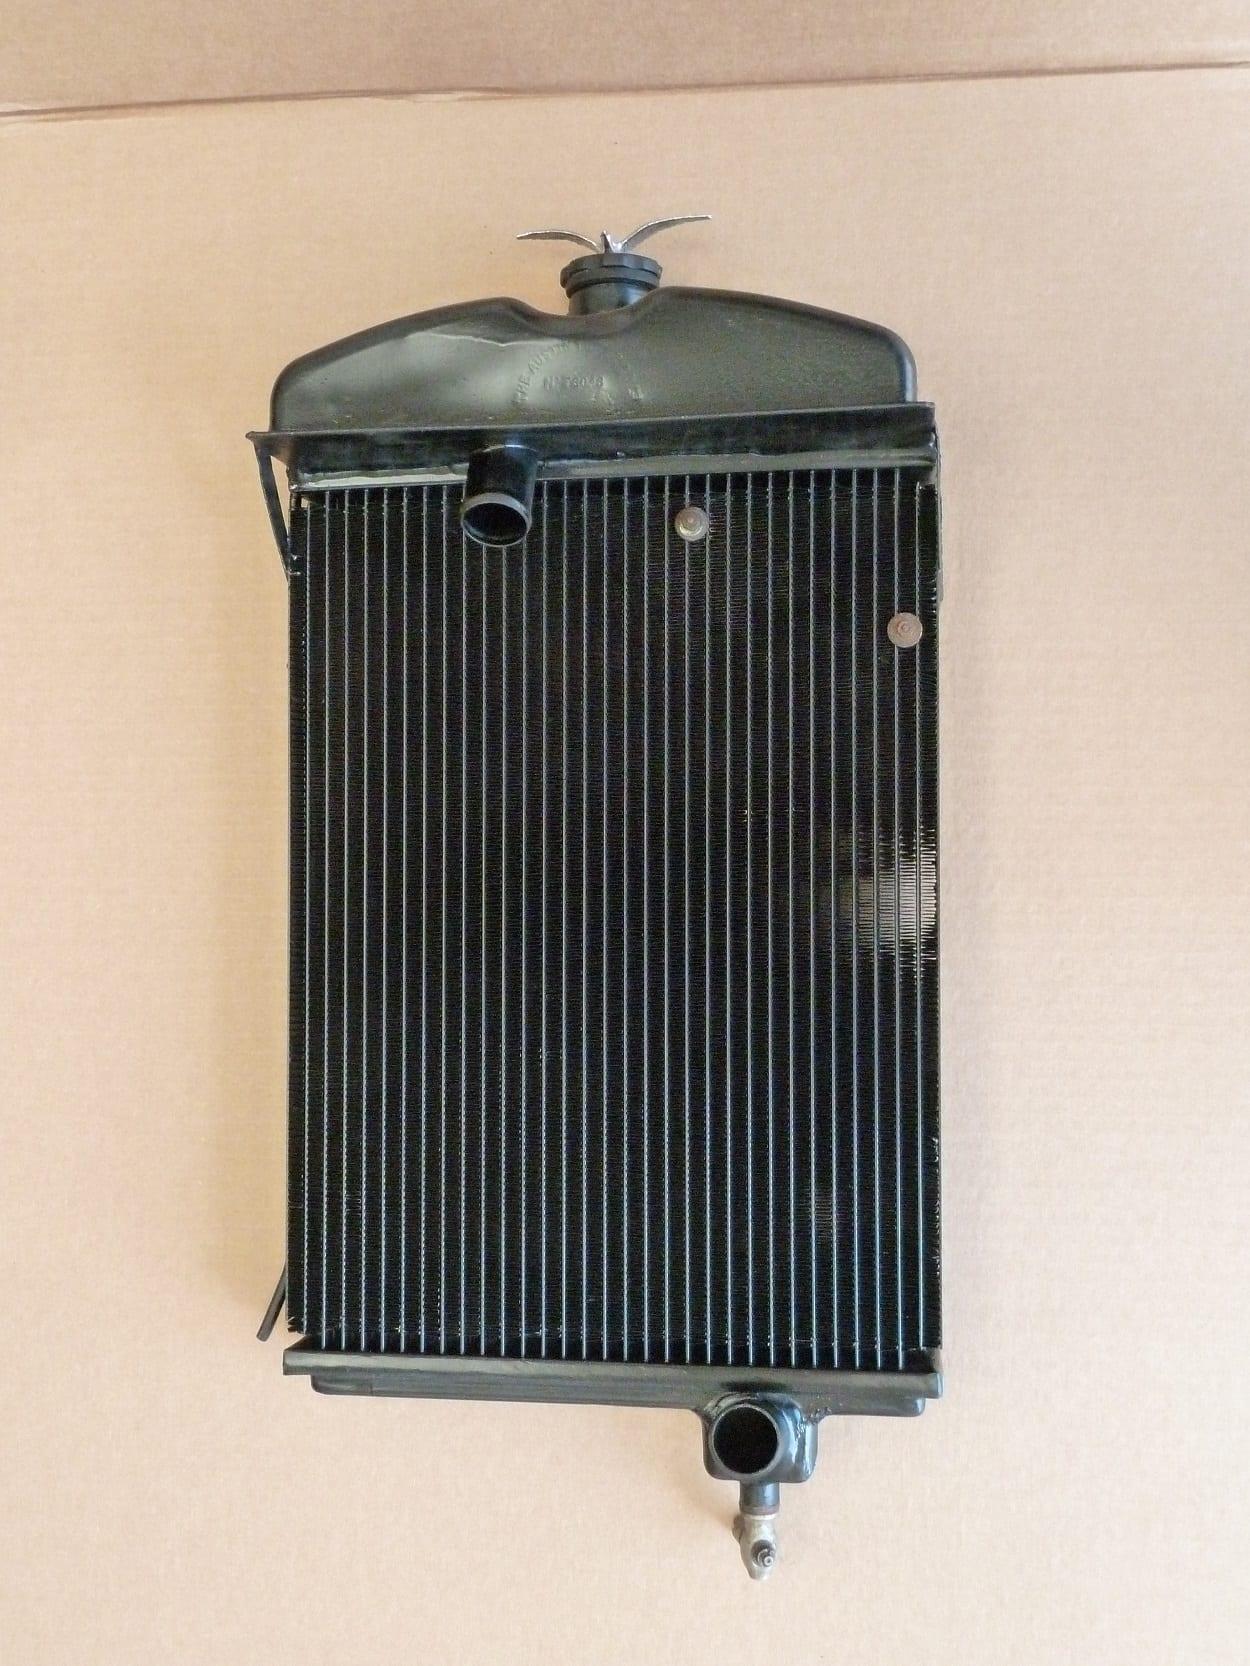 Austin 7 Radiator Recored Crediton Devon